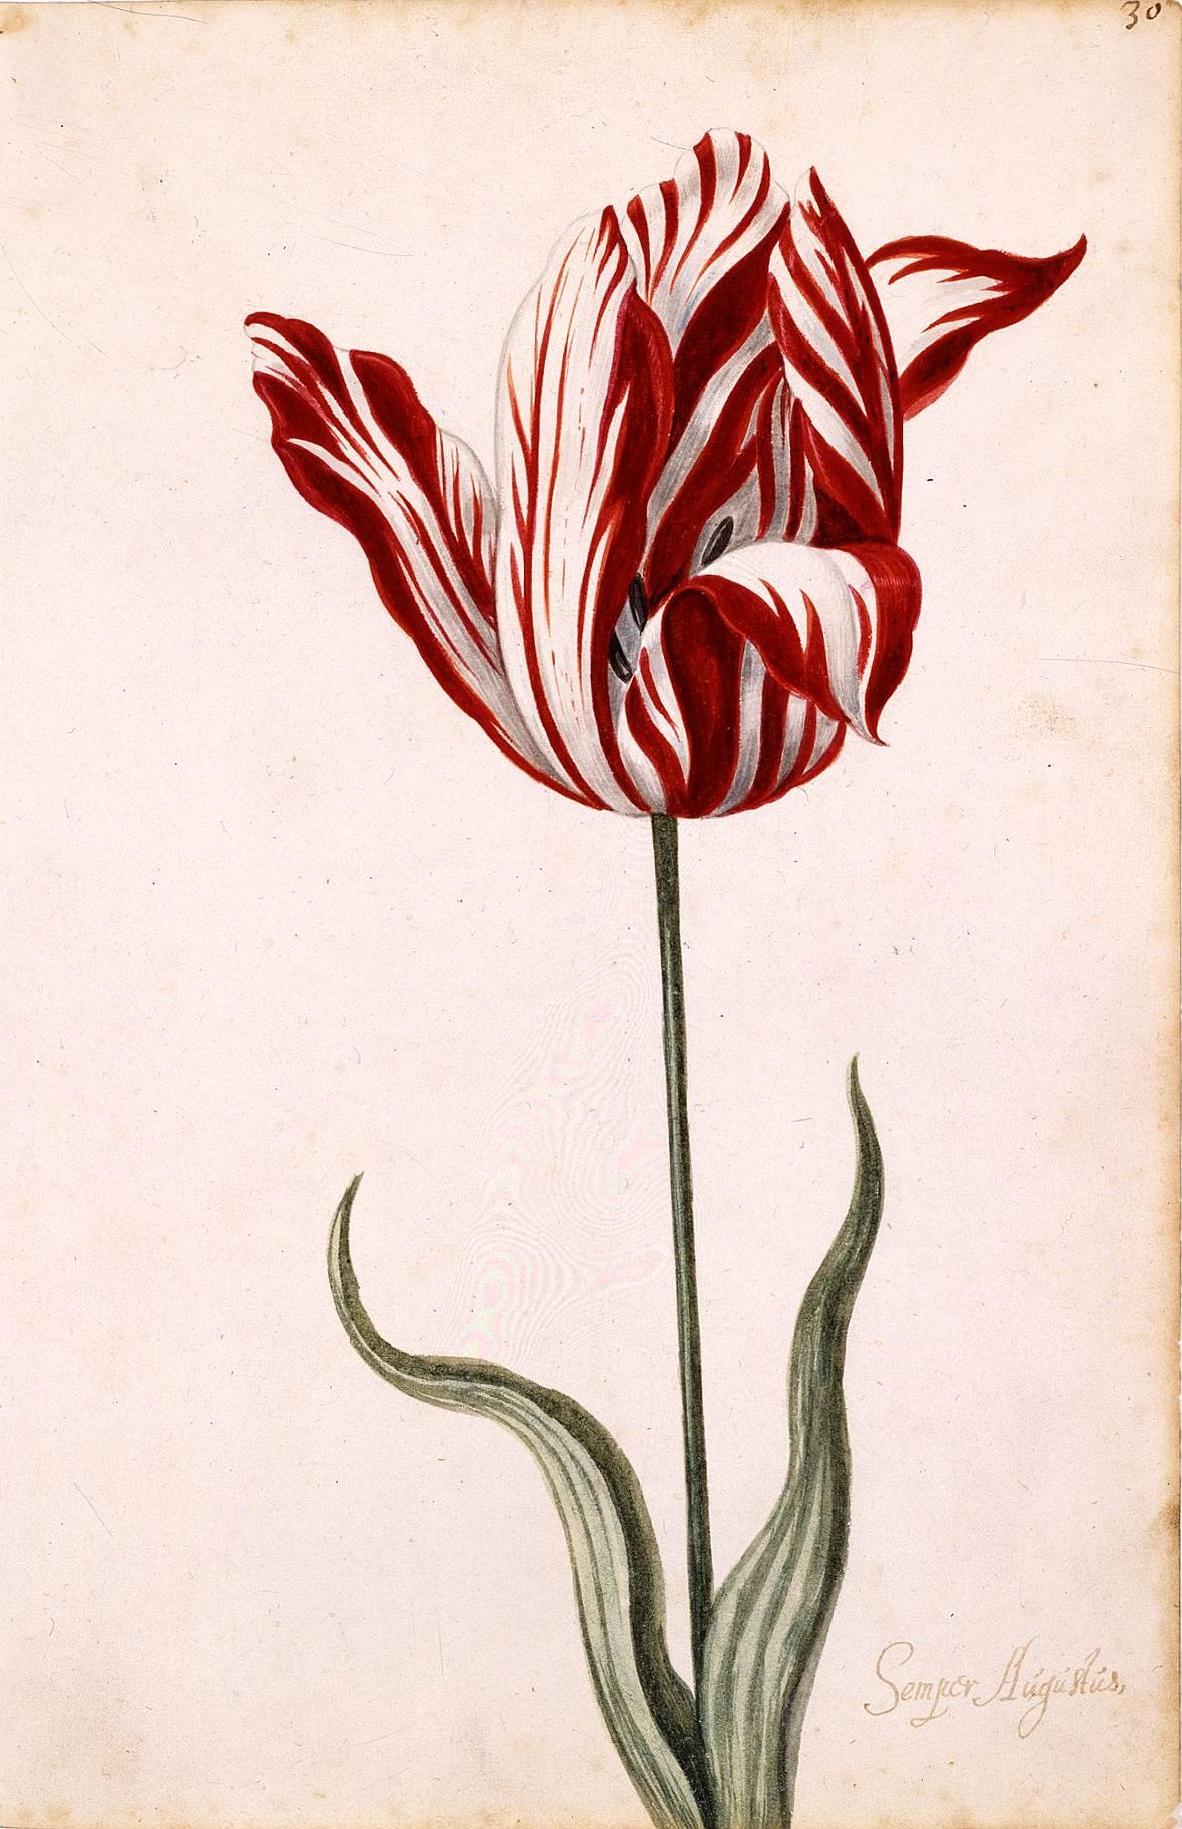 Tulipán Semper Augustus, pintado con acuarela